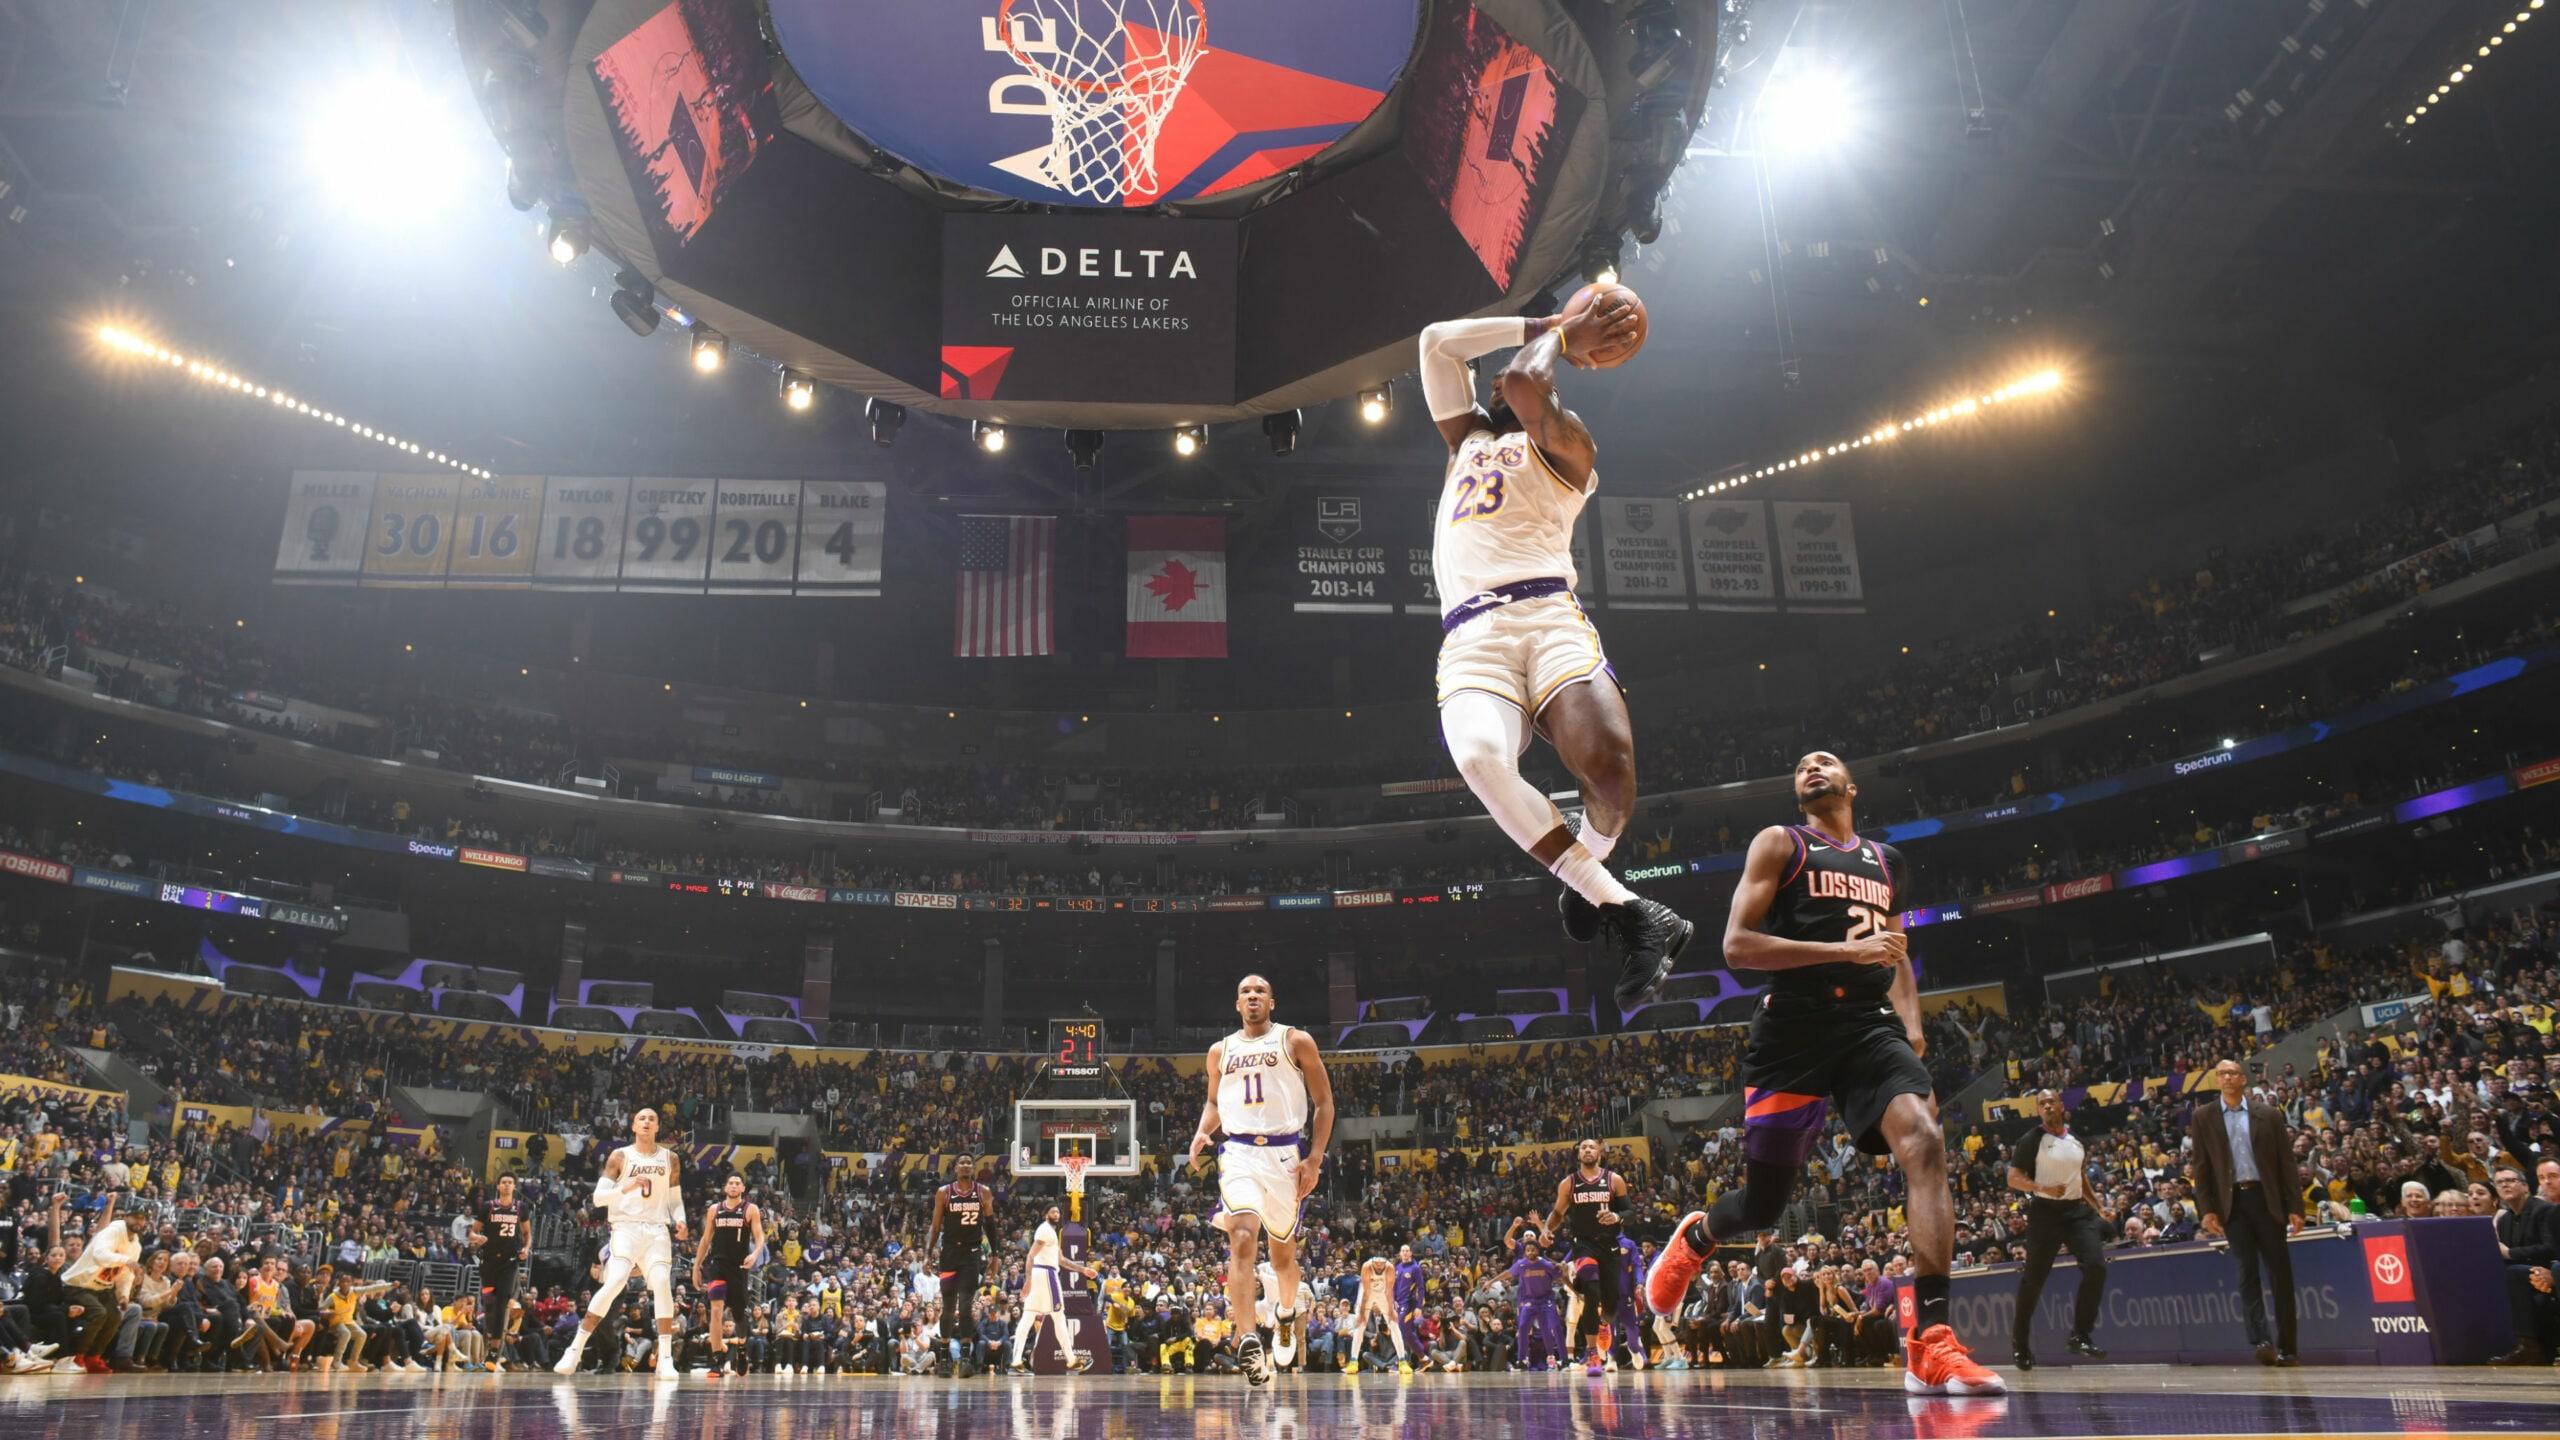 Suns @ Lakers